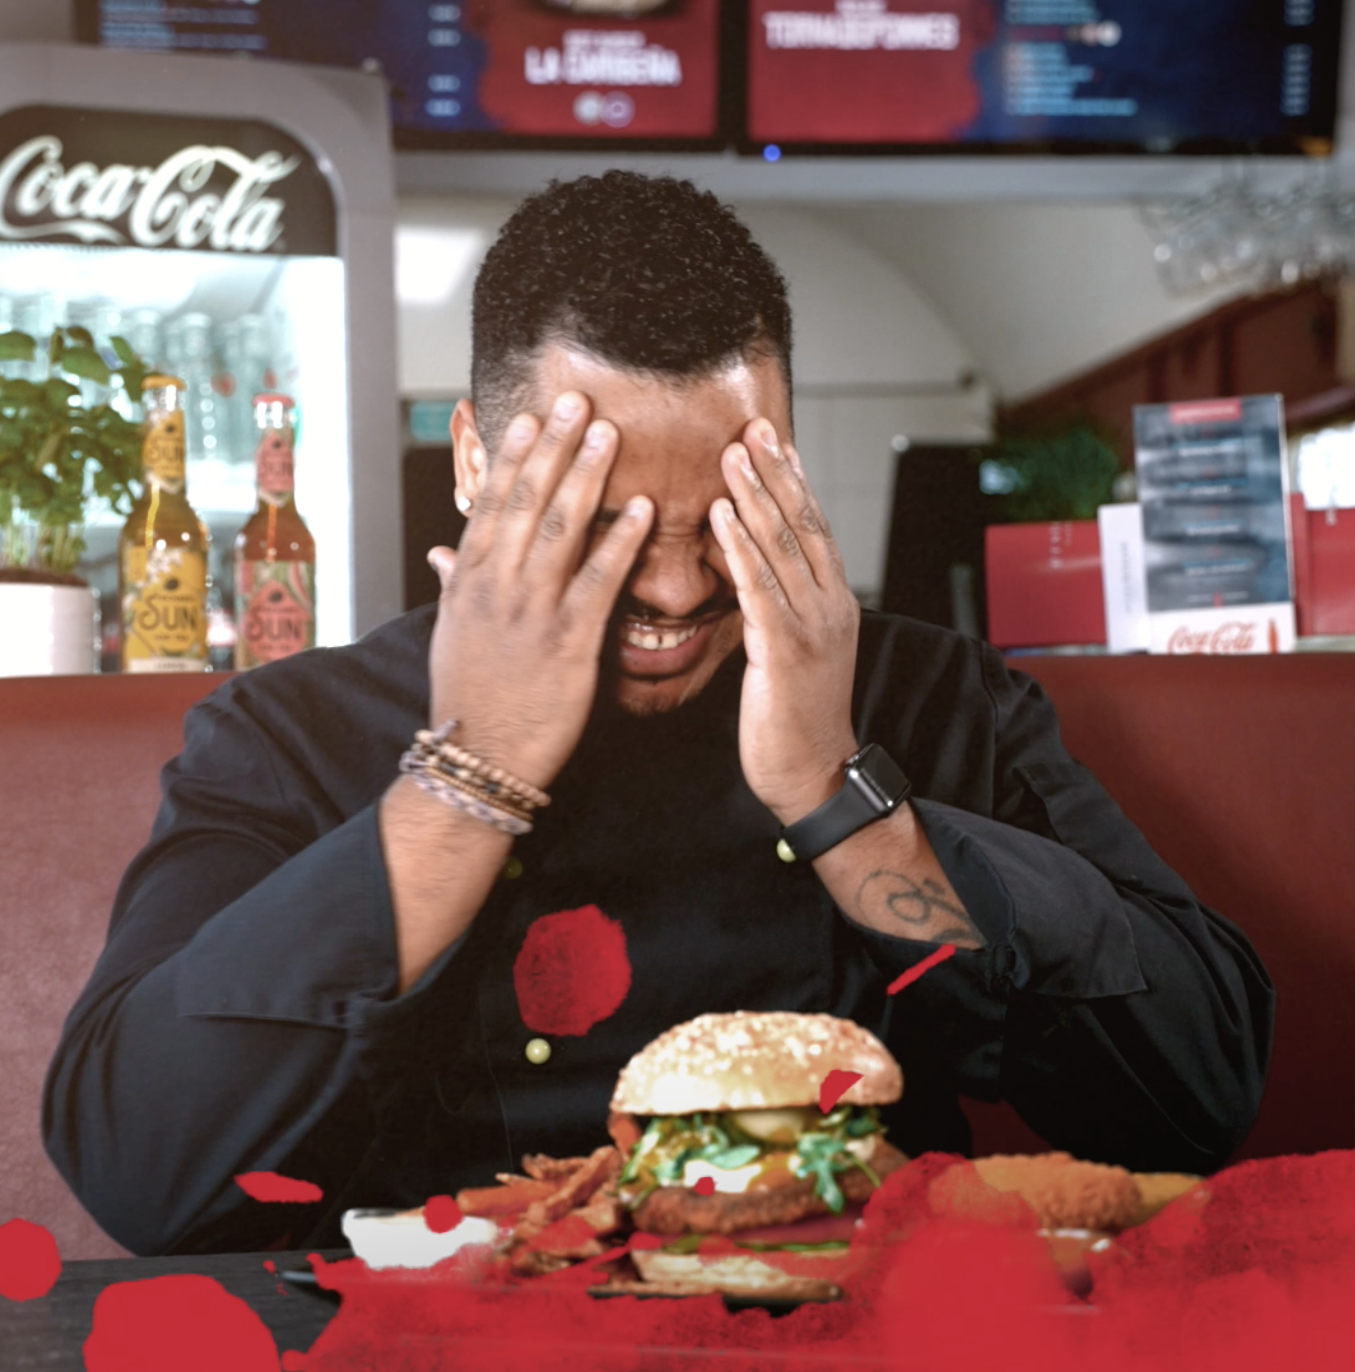 ersteklasse burger Beitragsbild interview frag Luiggi